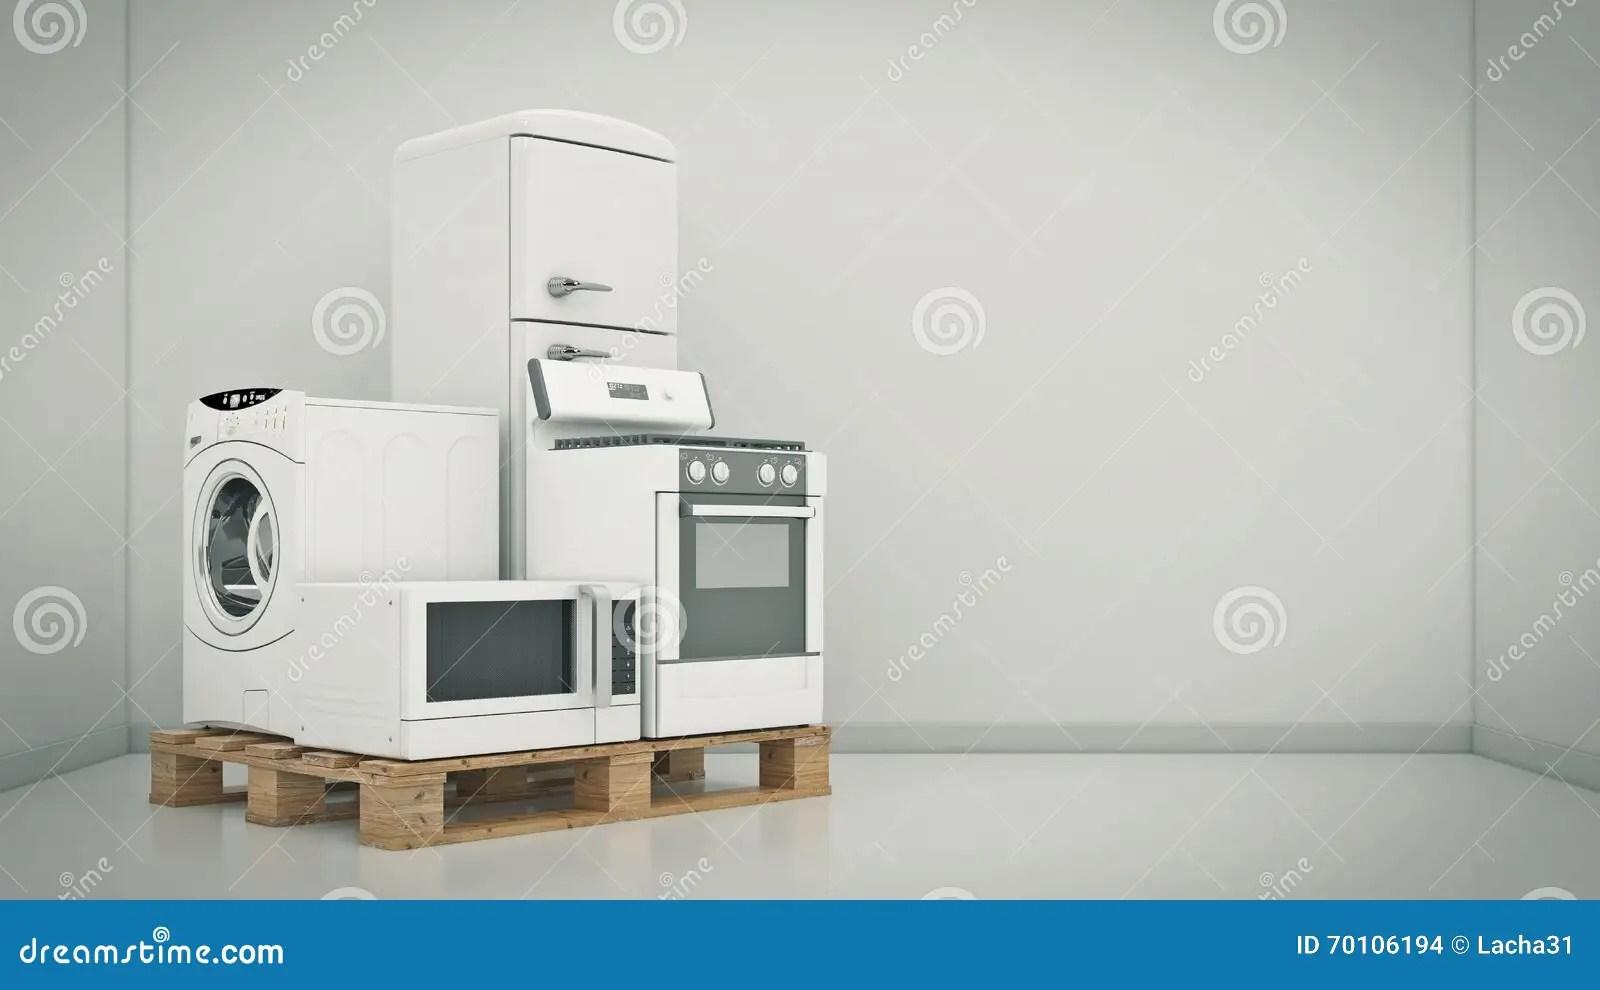 kitchen design tools amish table 工具设计家图标厨房设置了您套家庭厨房技术库存例证 插画包括有设计 工具设计家图标厨房设置了您套家庭厨房技术